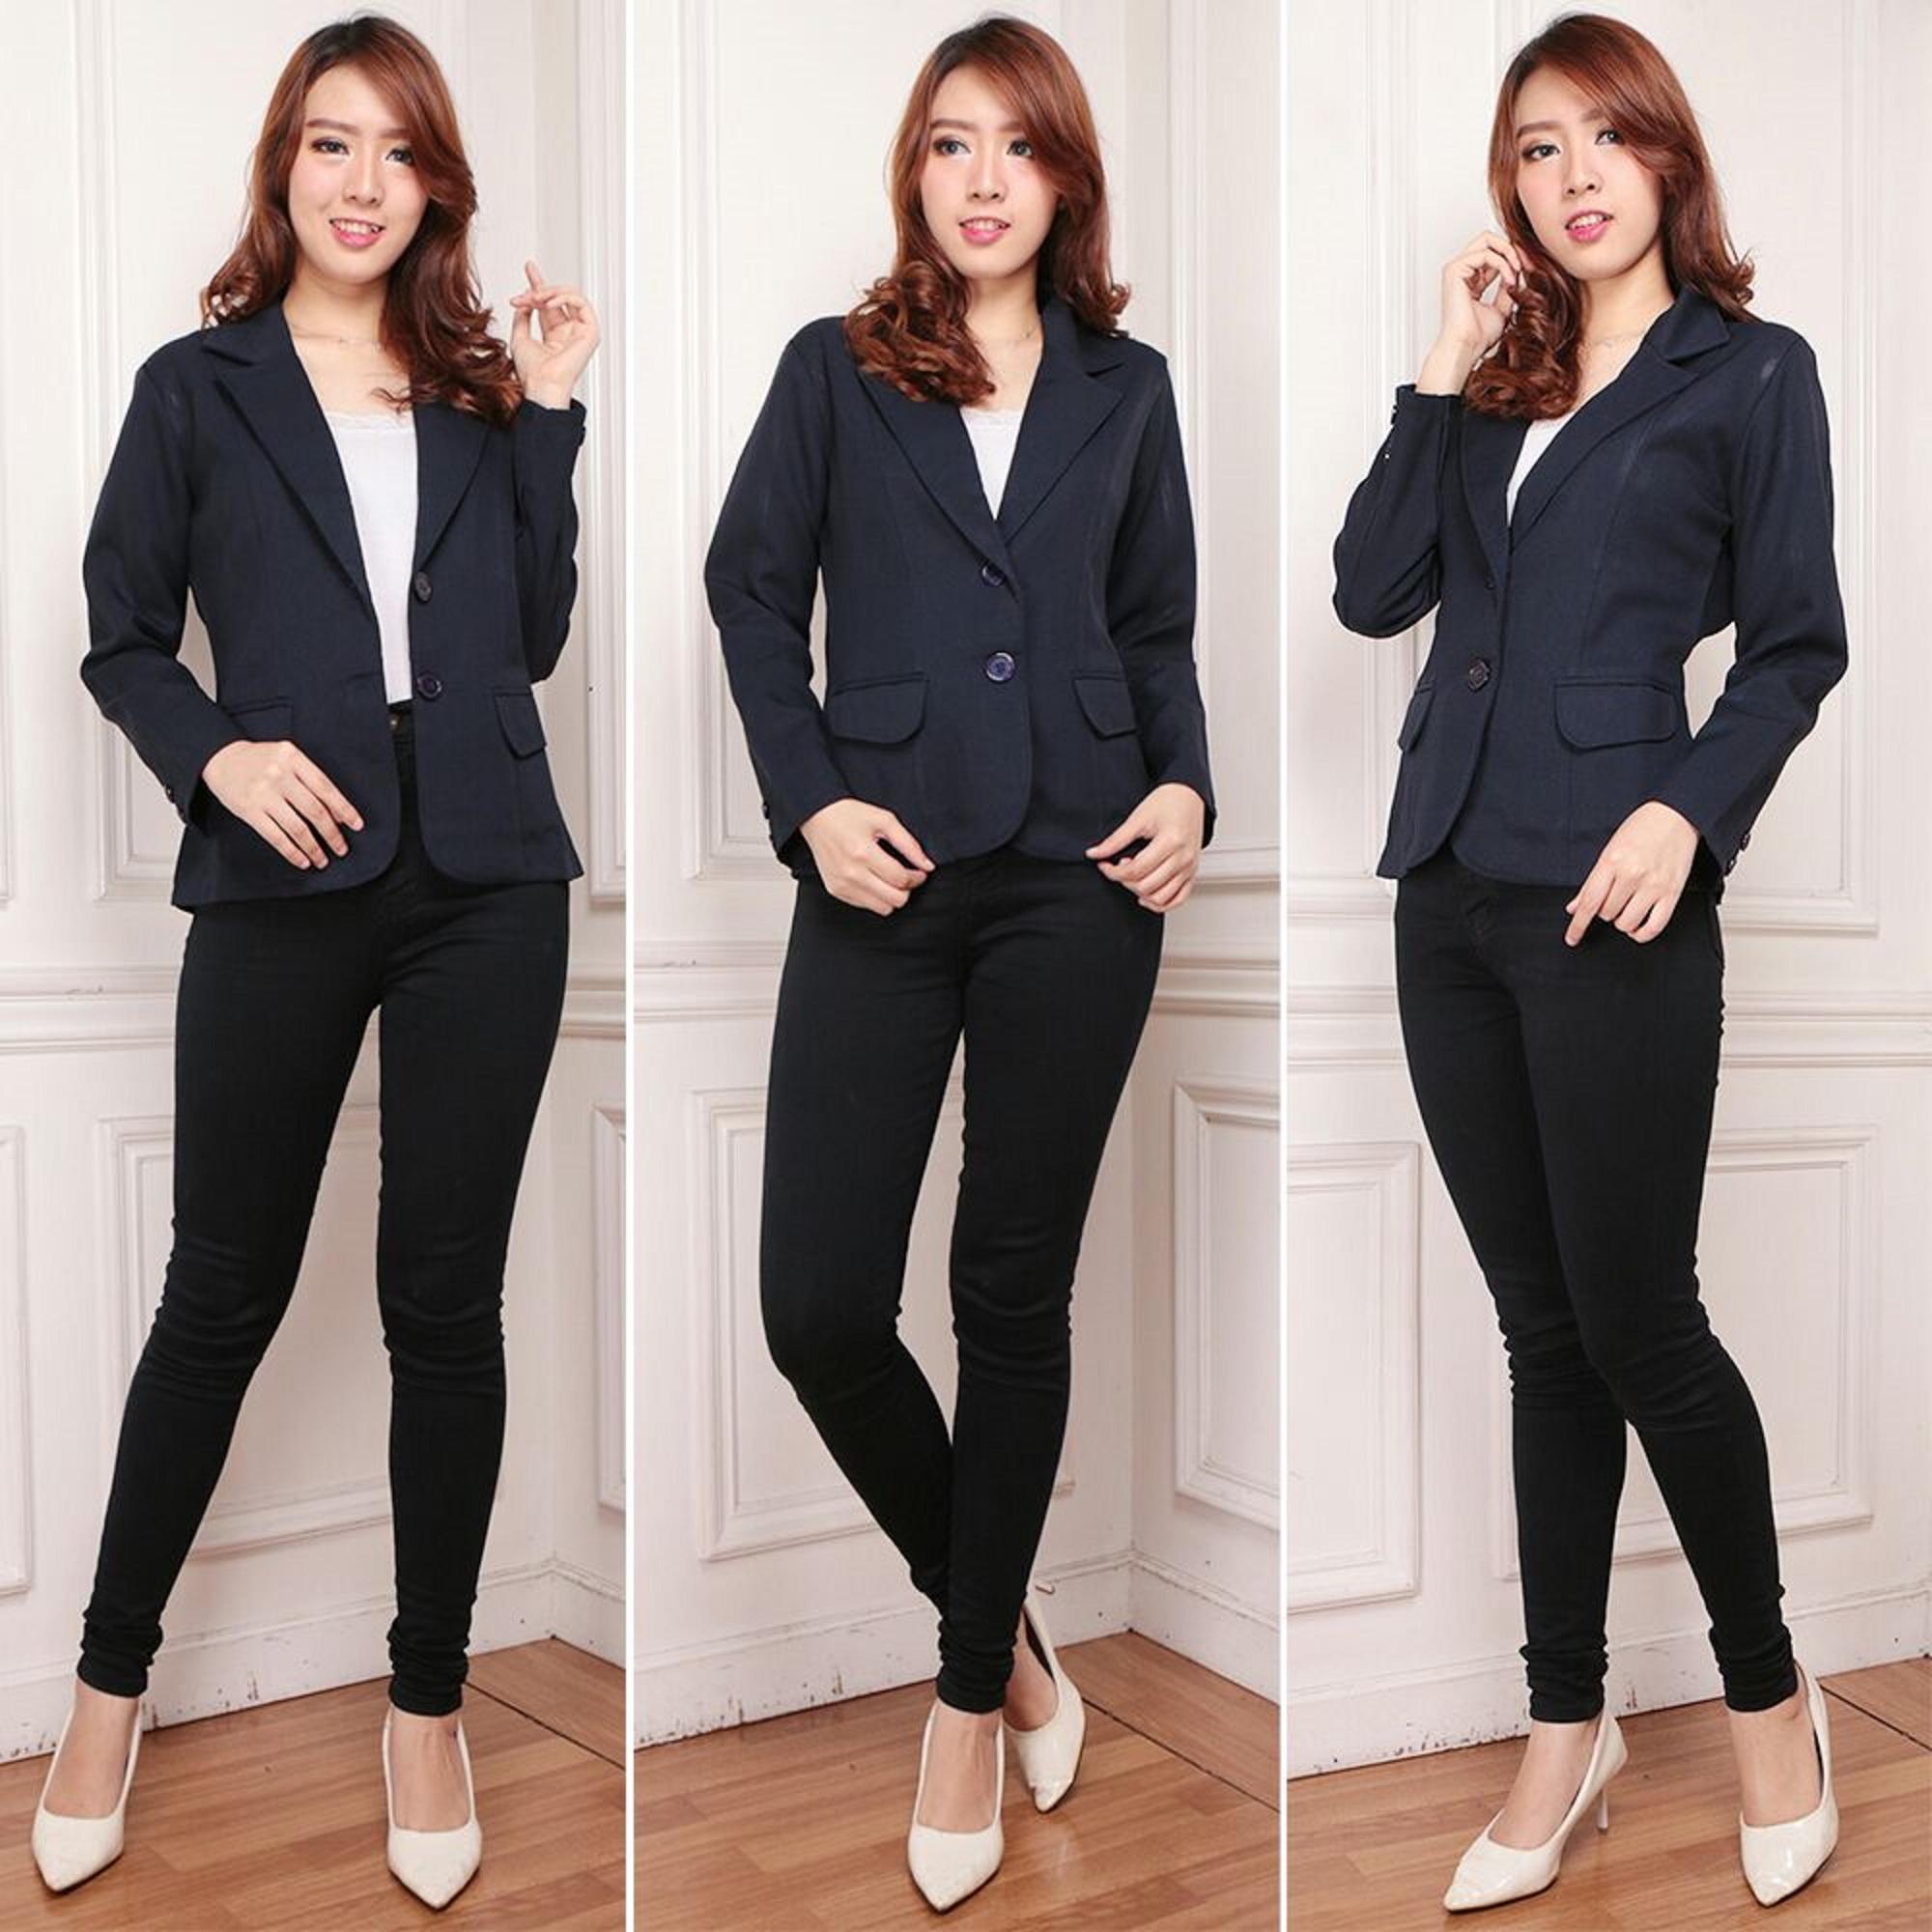 Model Baju Pns Wanita Berjilbab - Model Baju Terbaru 2019